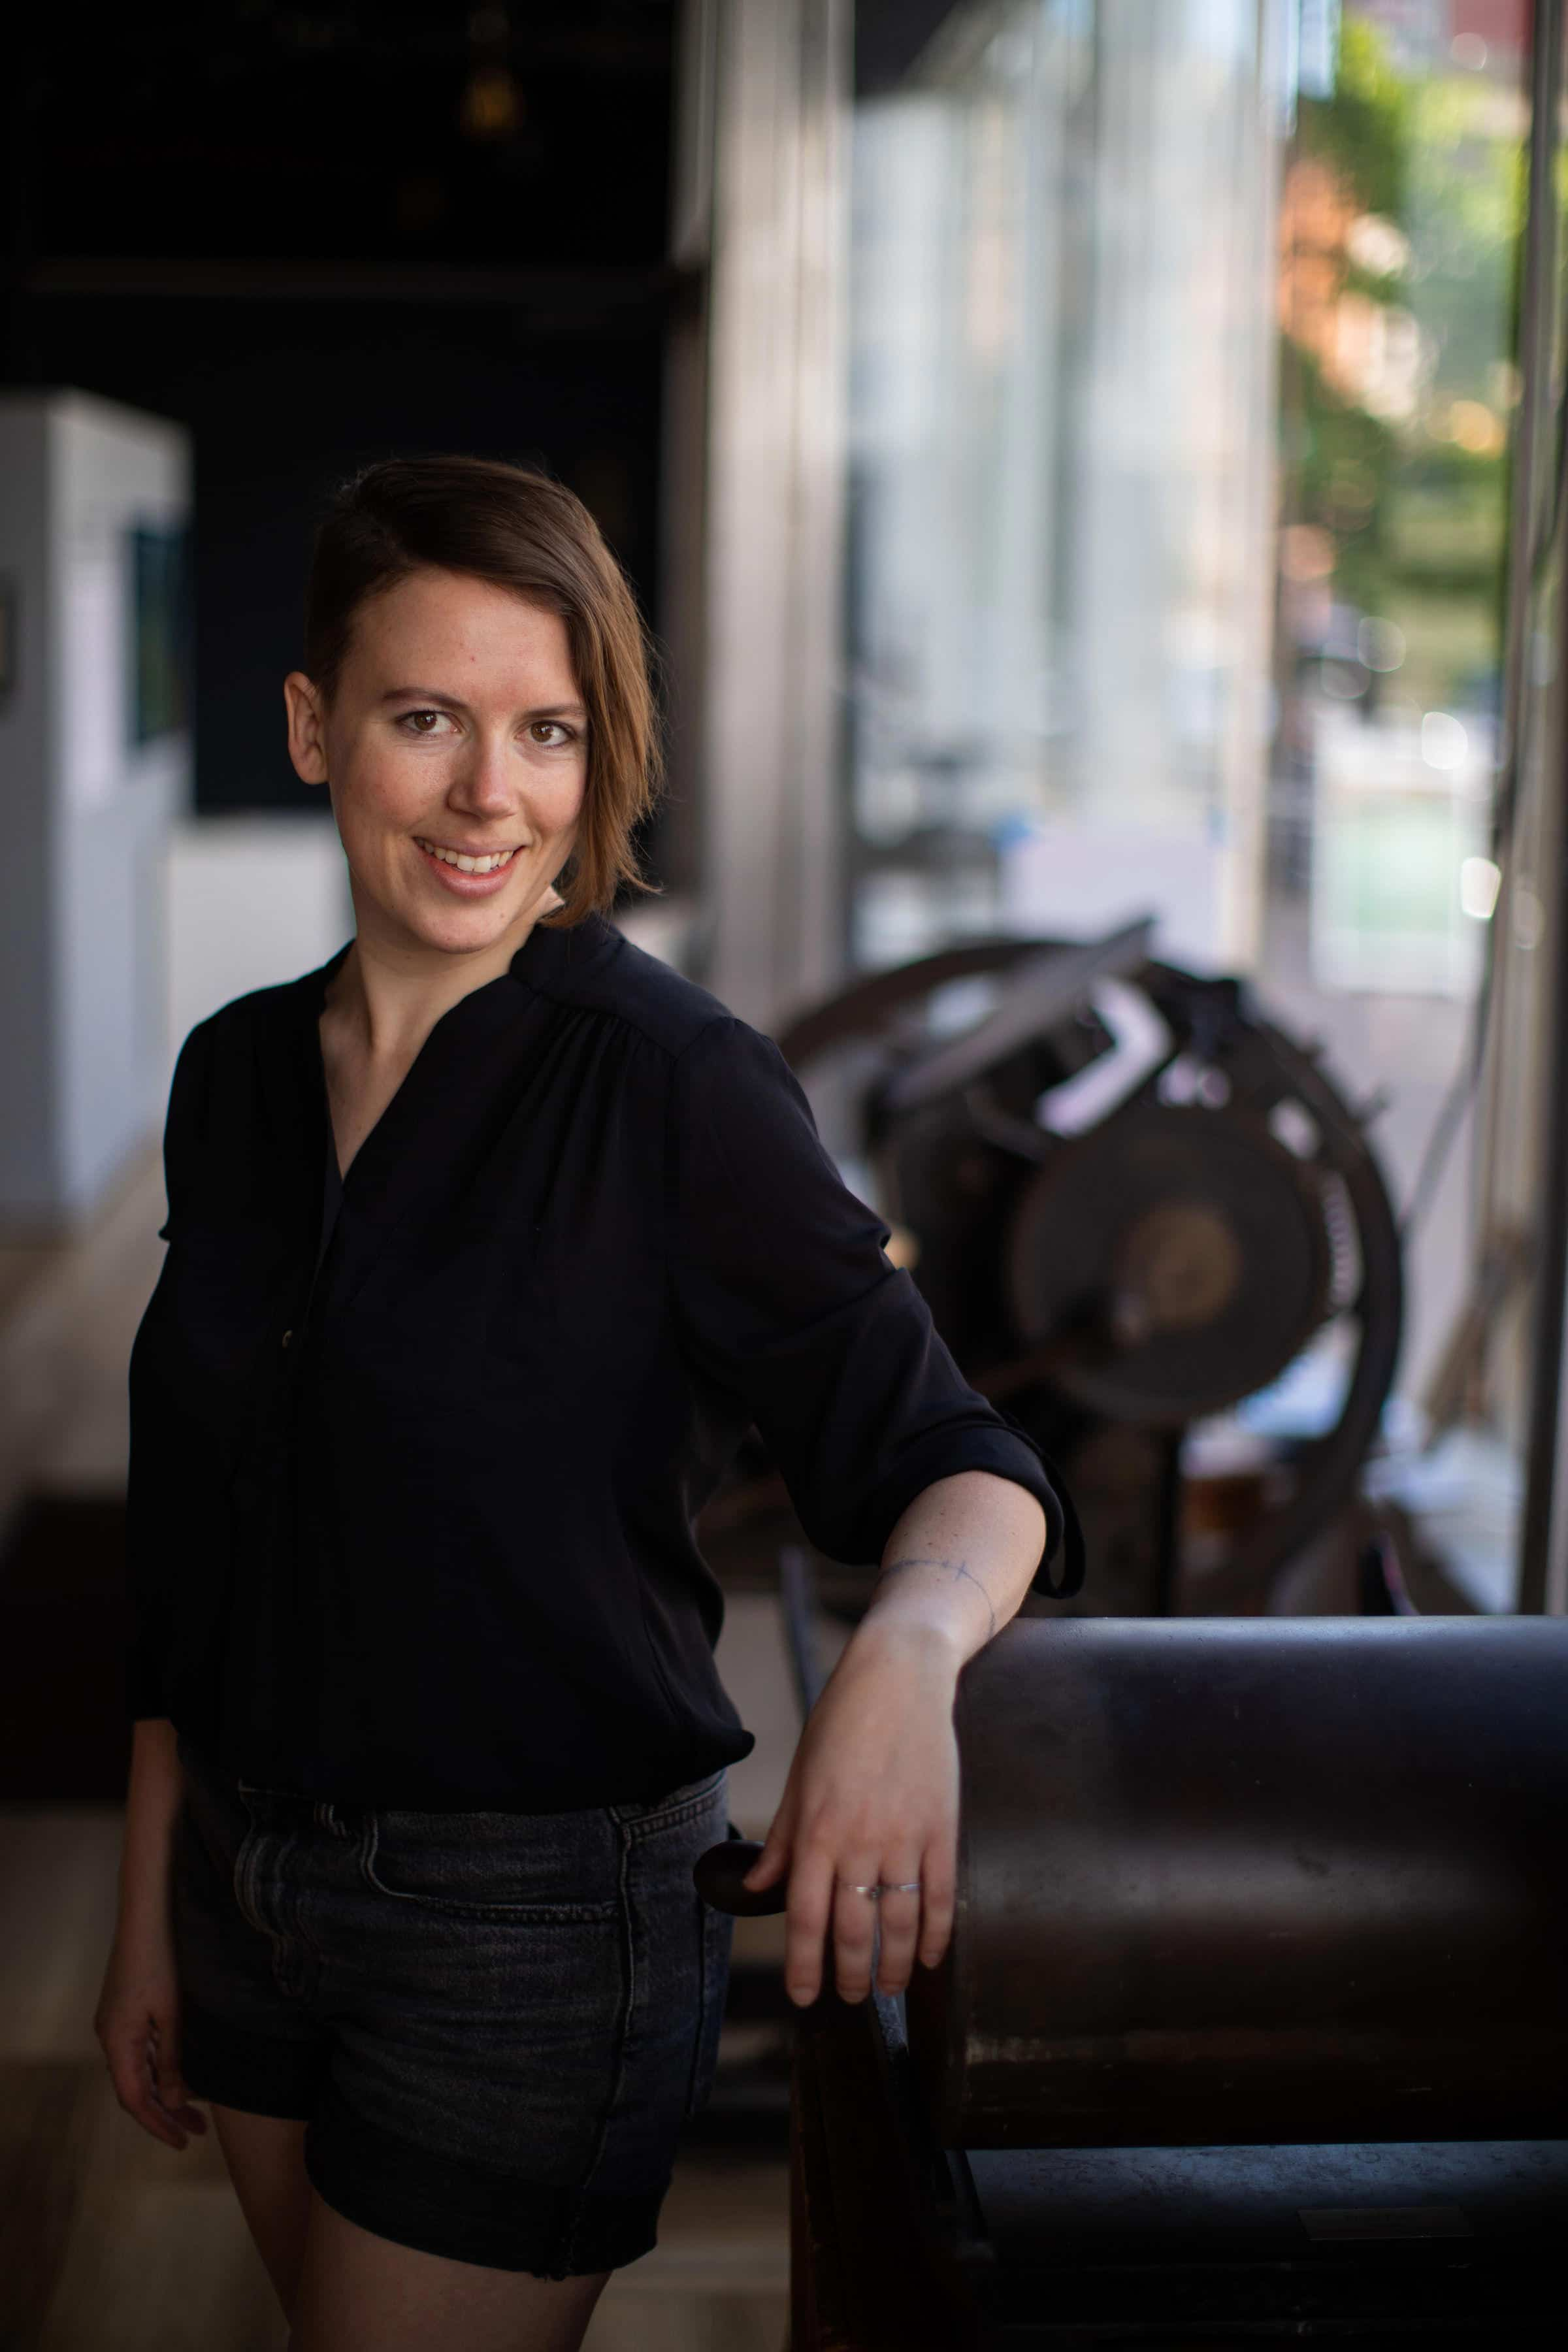 Kate MacNeil